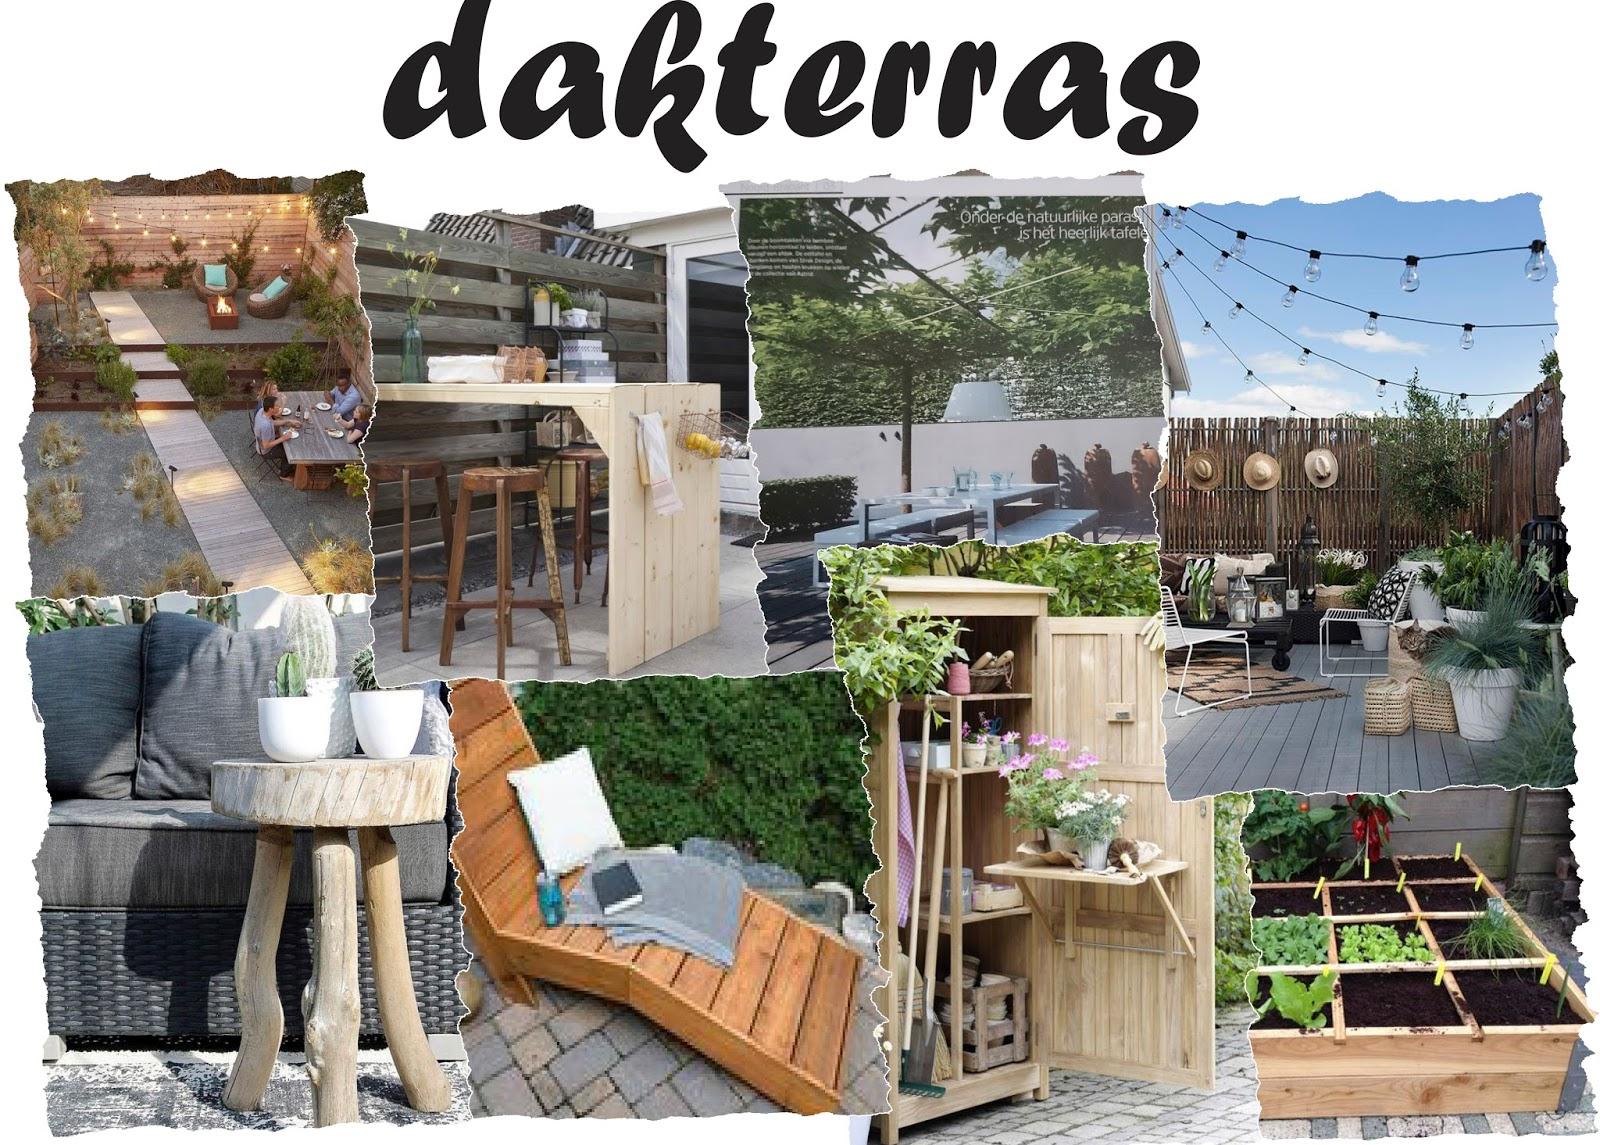 Dakterras design affordable kunstgras als dakterras with